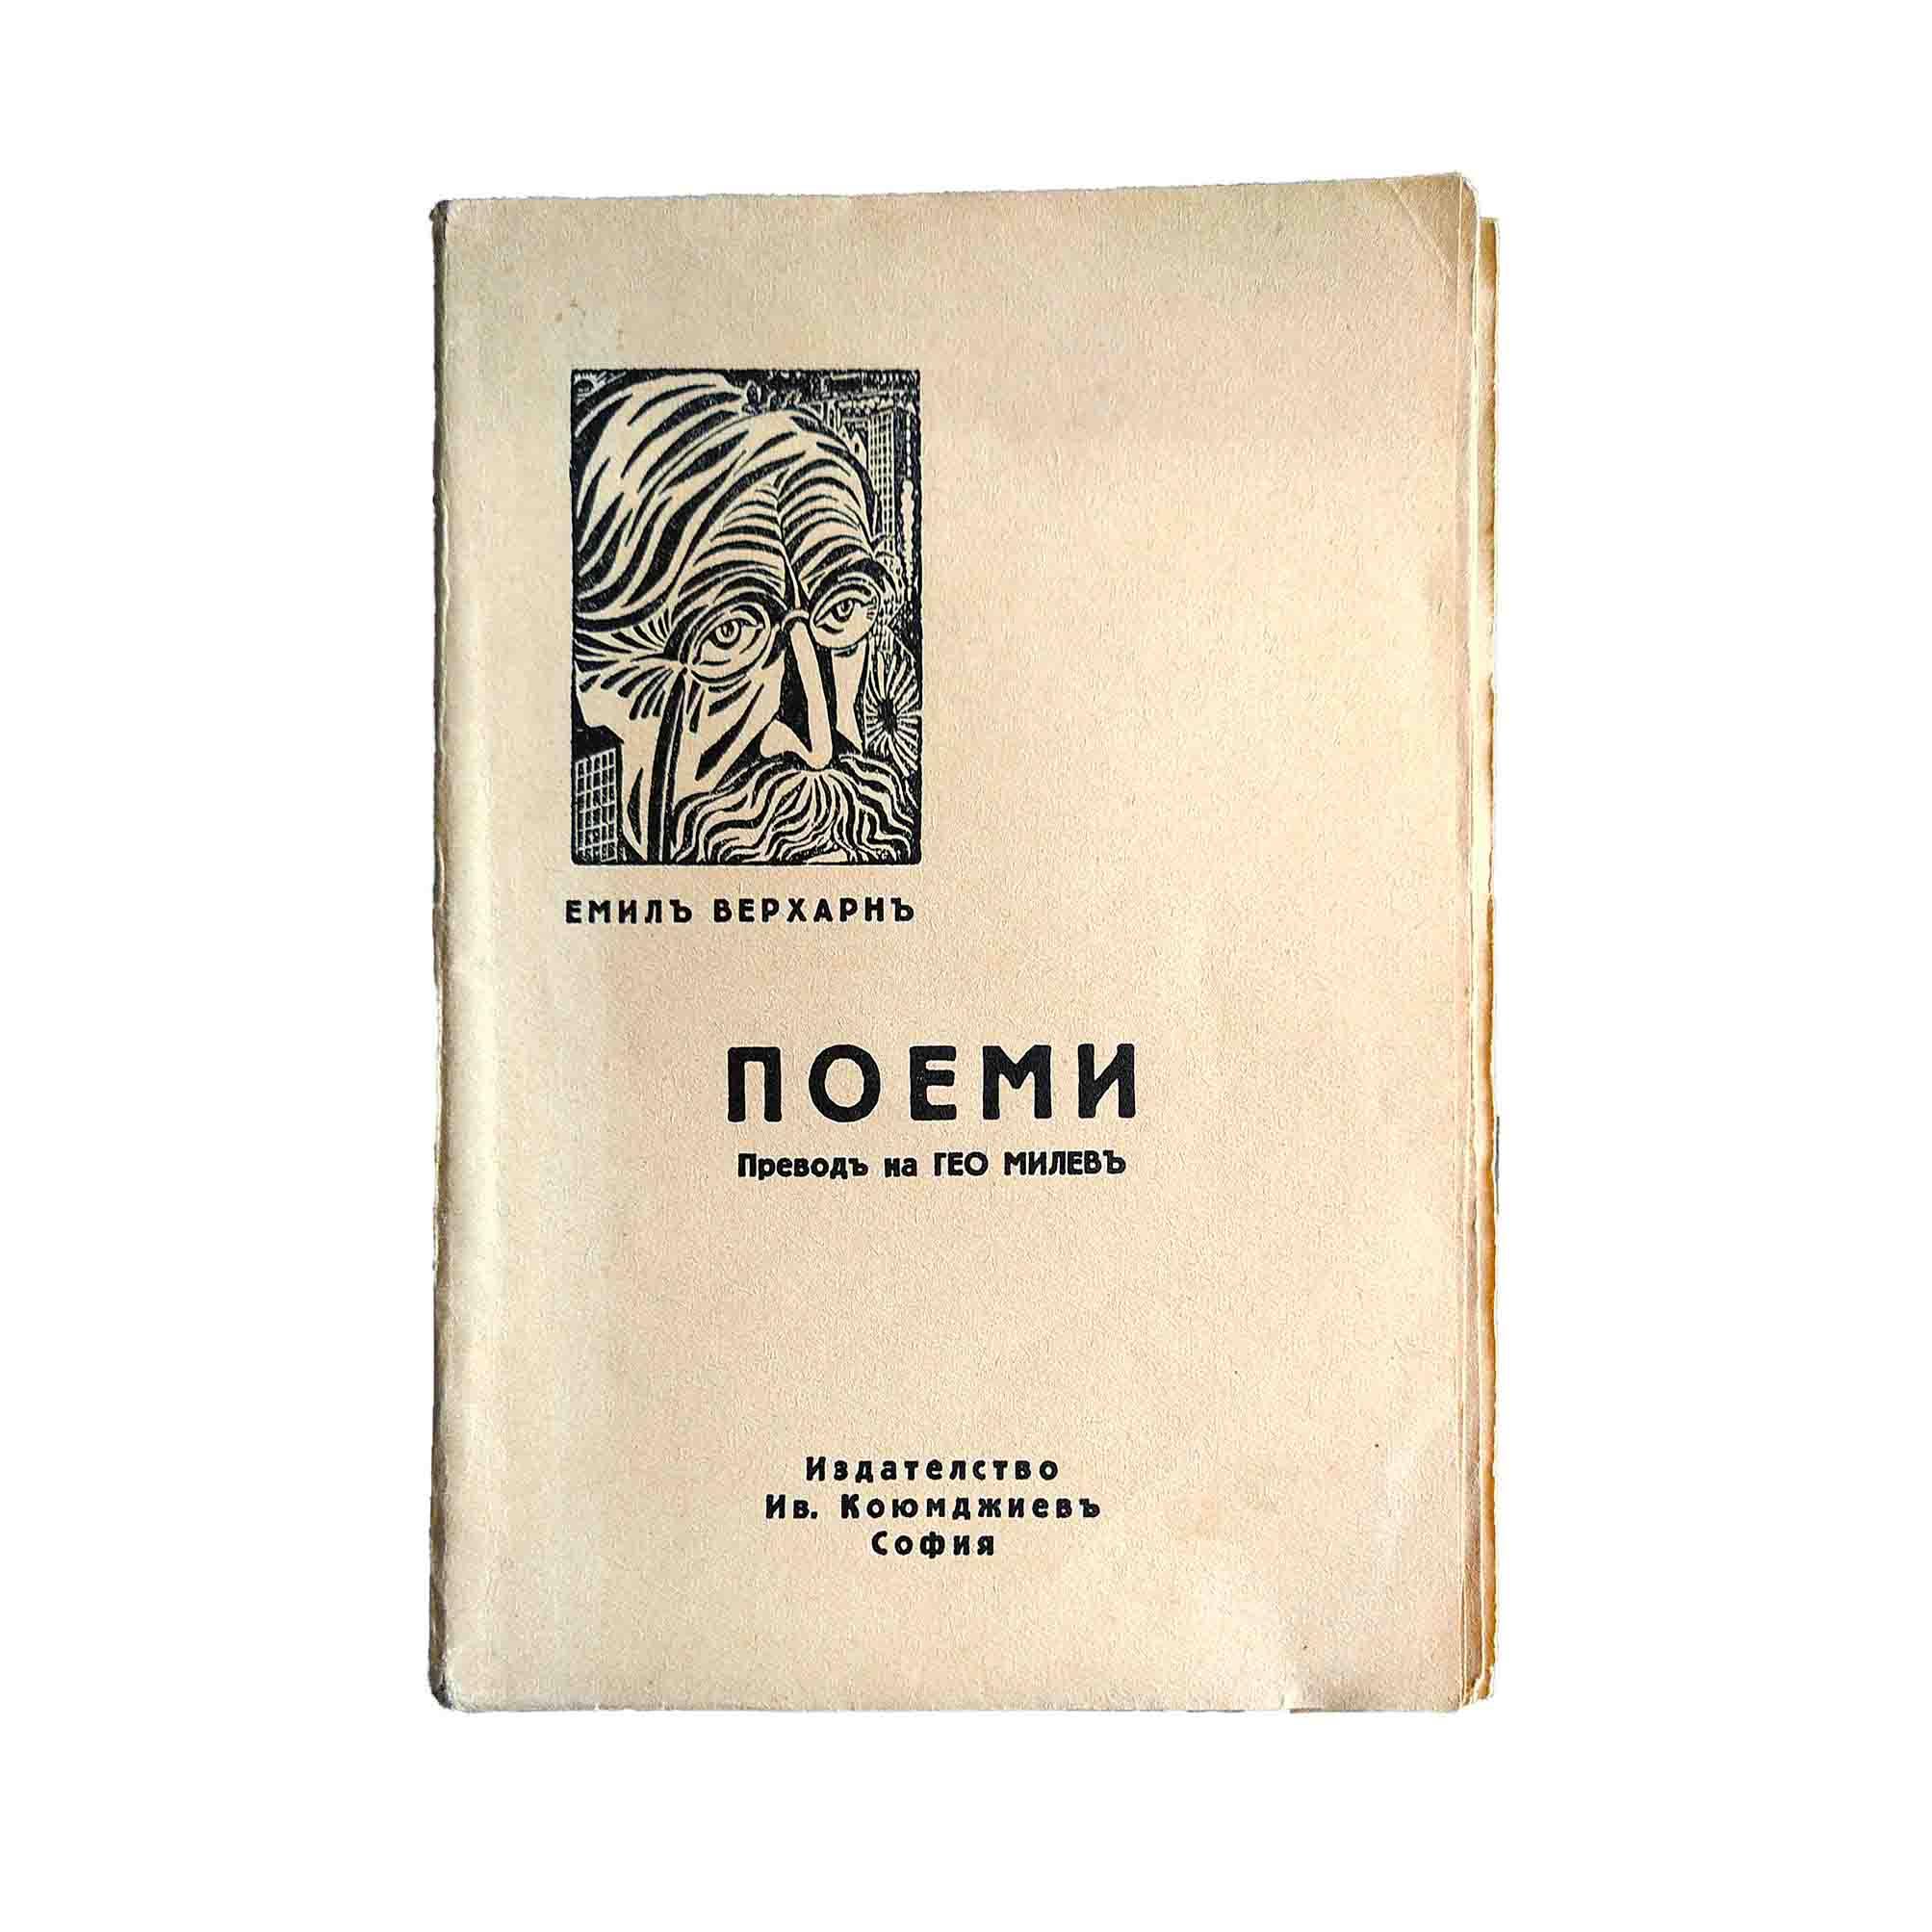 5844-Verhaeren-Milev-Masereel-Poemi-1935-Umschlag-recto-frei-N.jpg